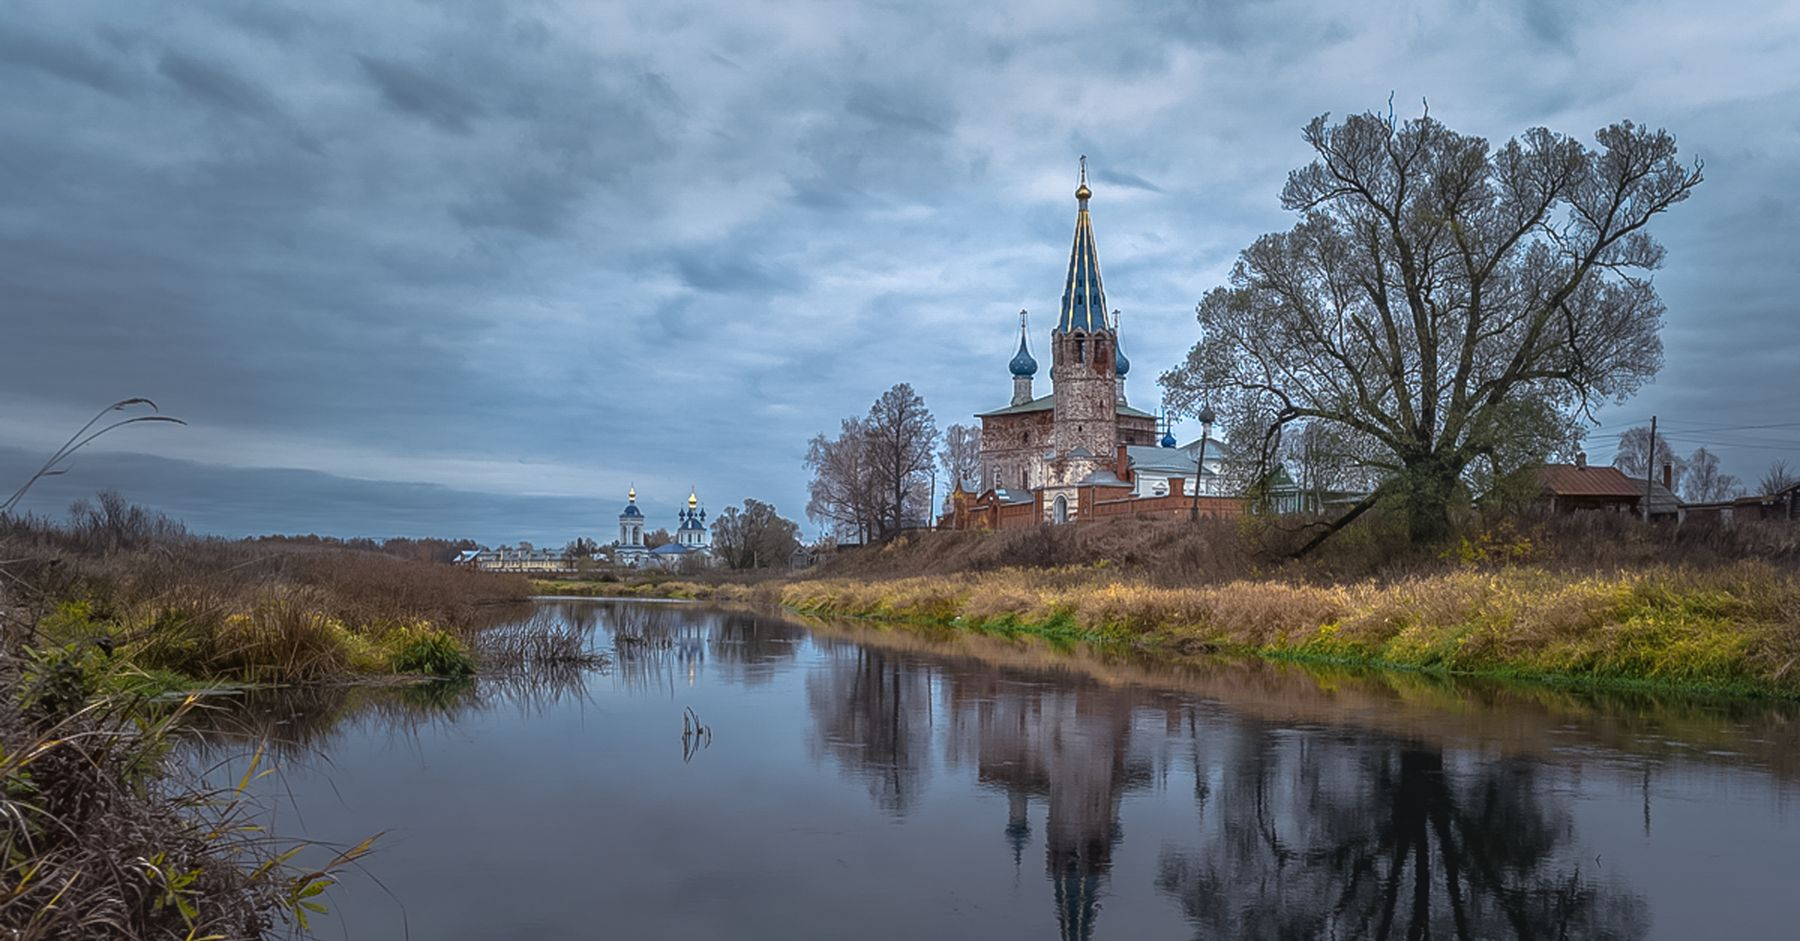 Осень вдруг прокричит нам свою неизбежность... речка теза село дунилово осень храм церковь